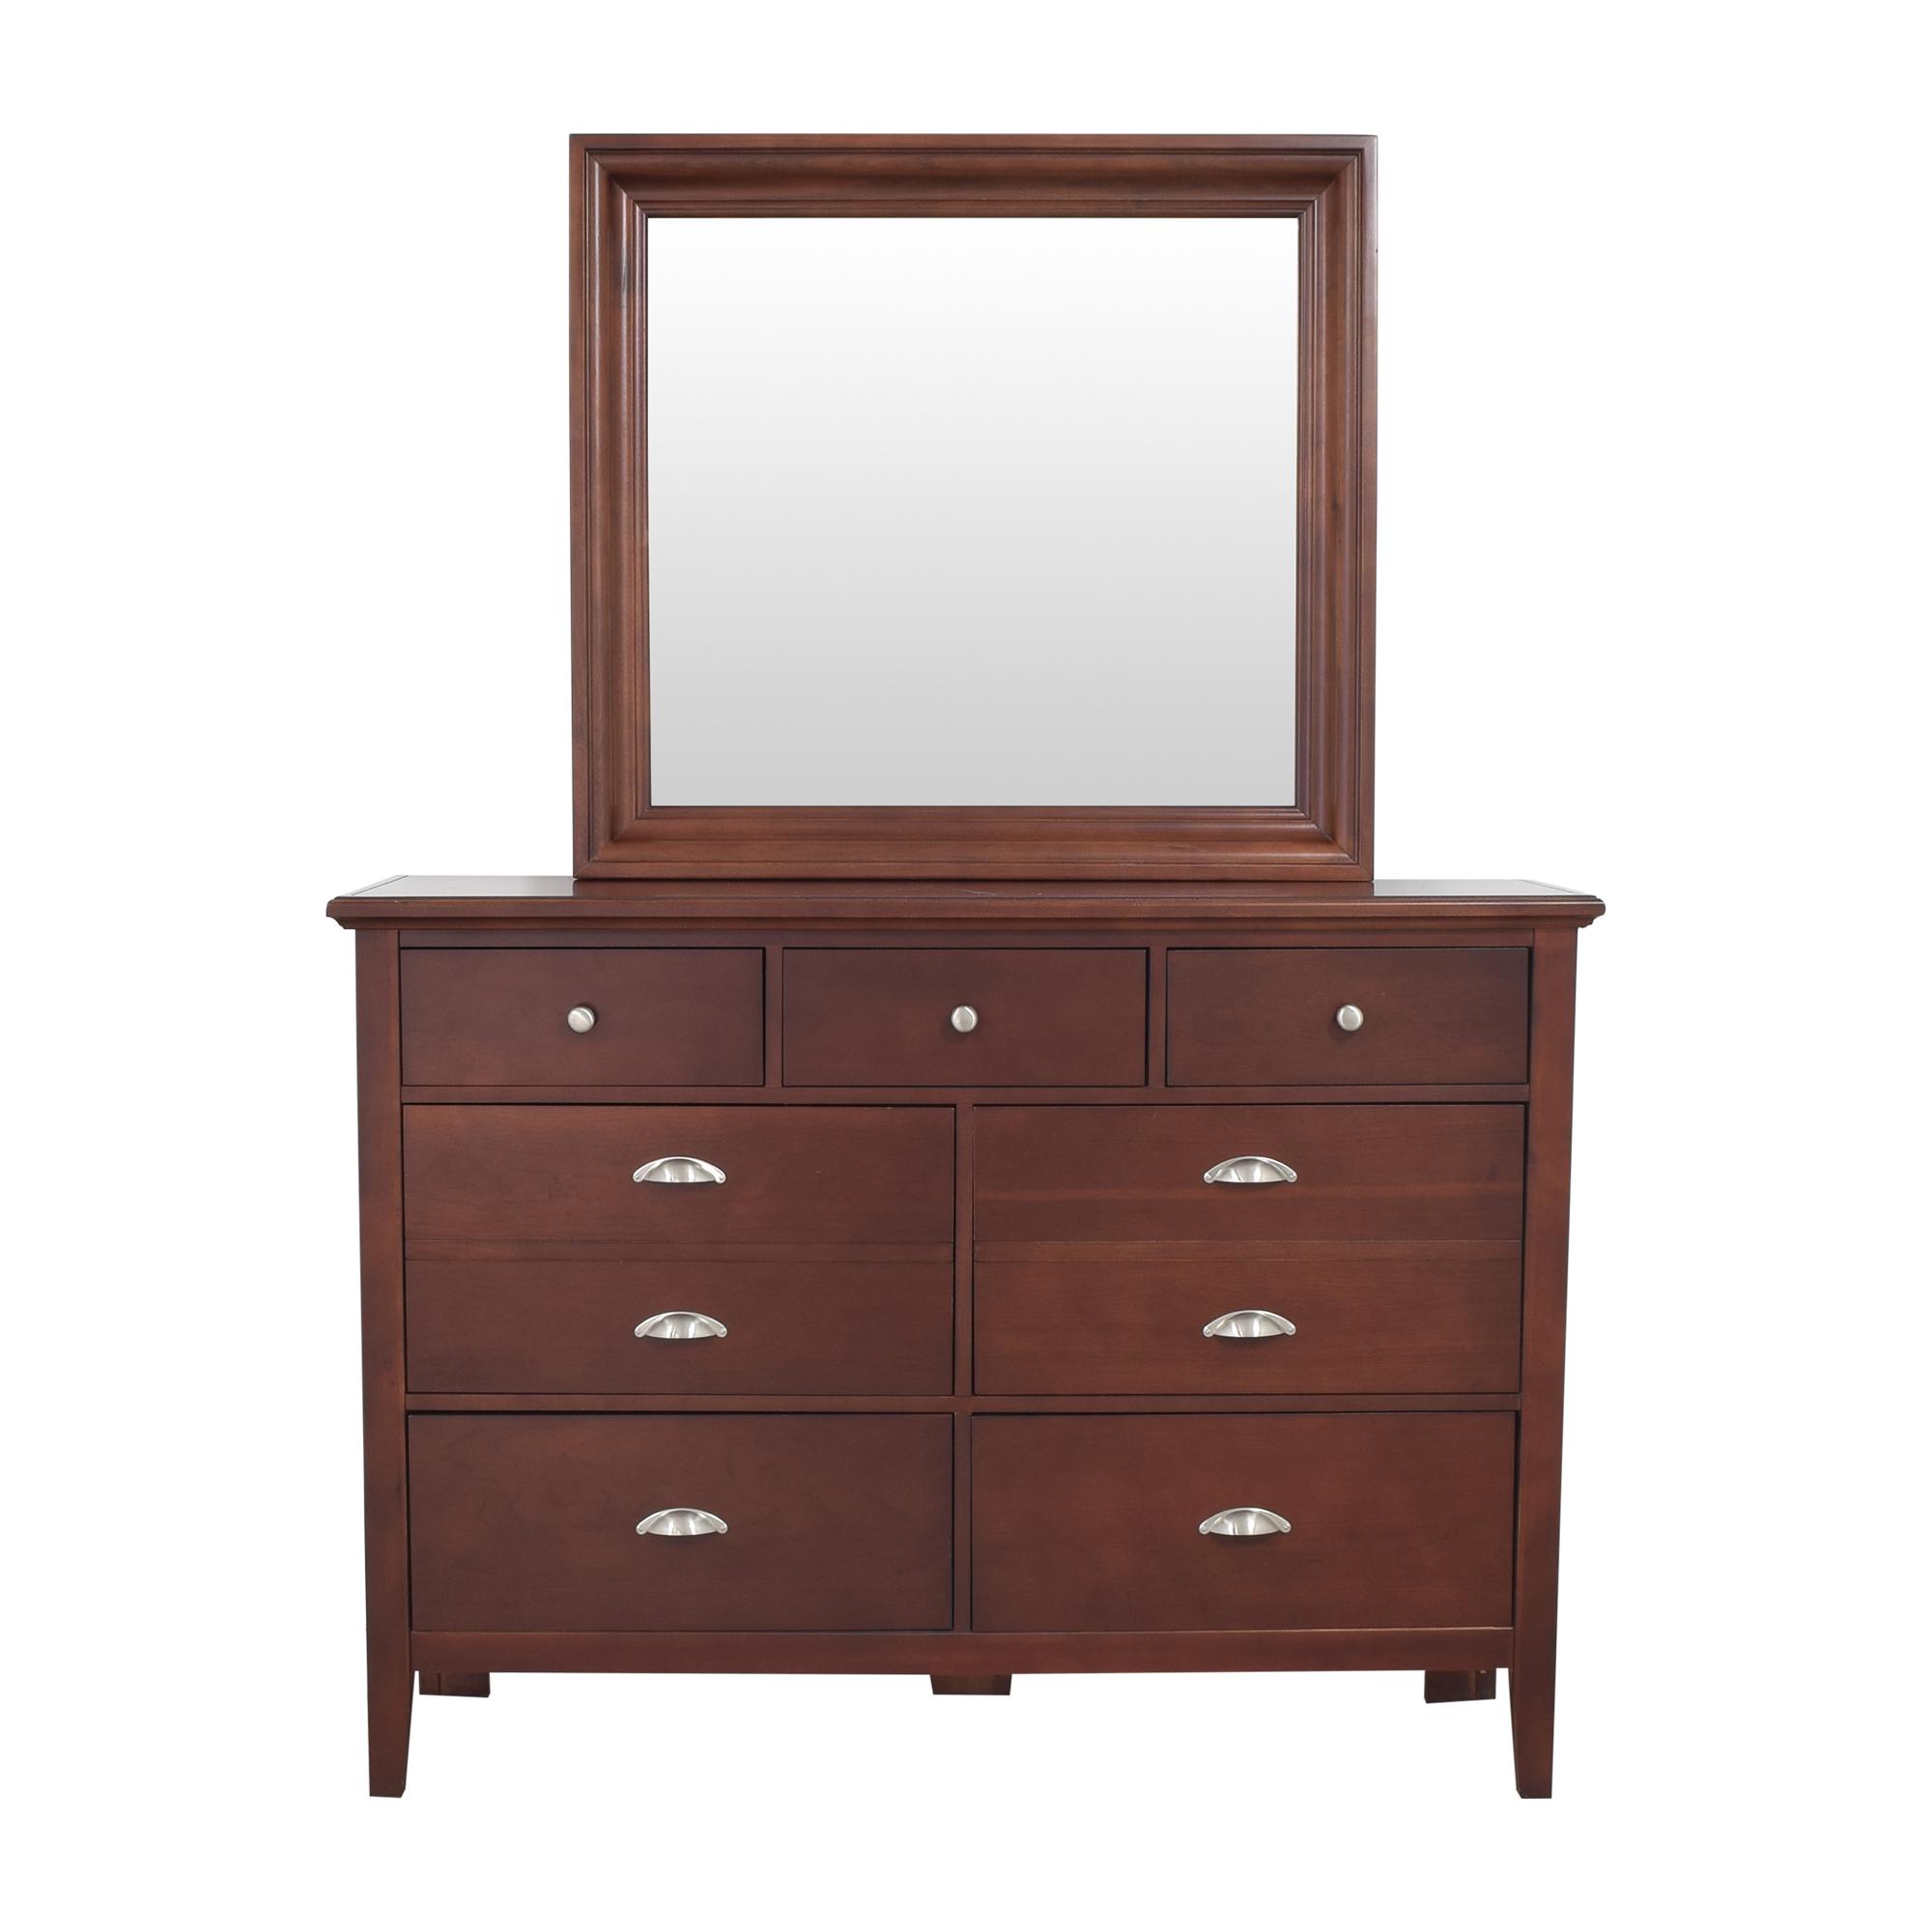 Vaughan-Bassett Vaughan-Bassett Twilight Triple Dresser with Mirror Storage